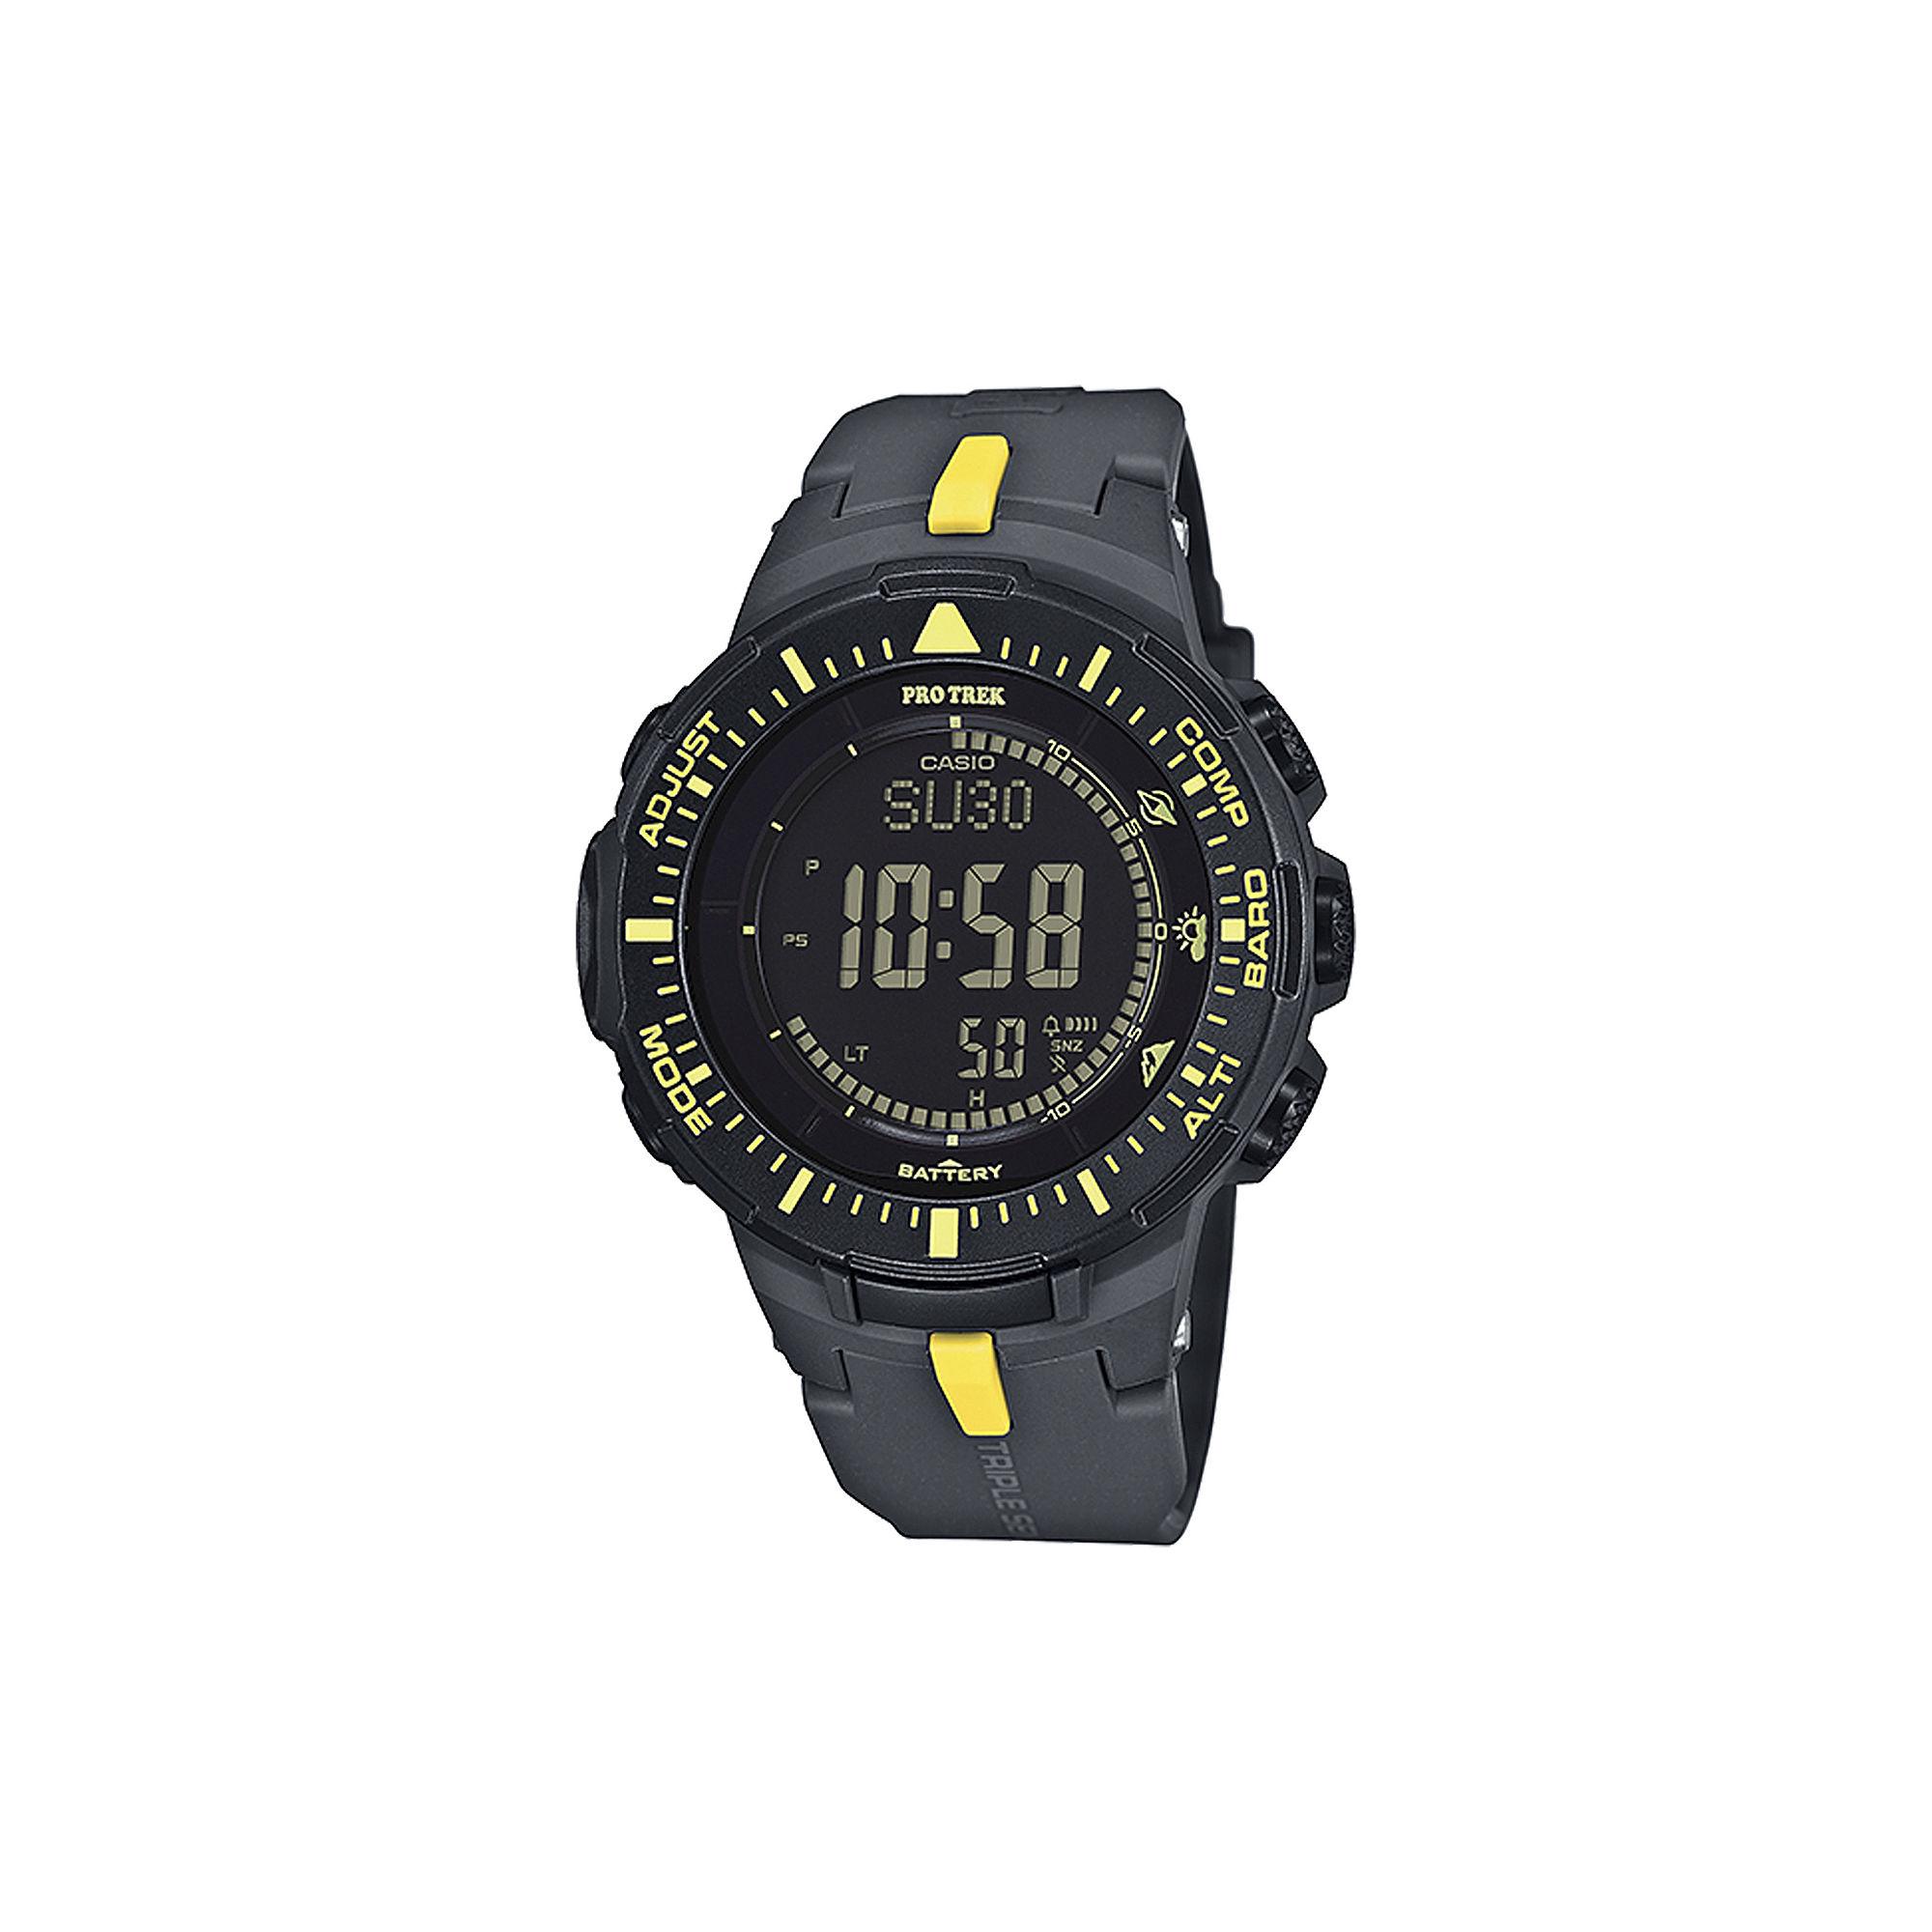 Casio Pro Trek Tough Solar Triple Sensor Mens World Time Watch PRG300-1A9CR